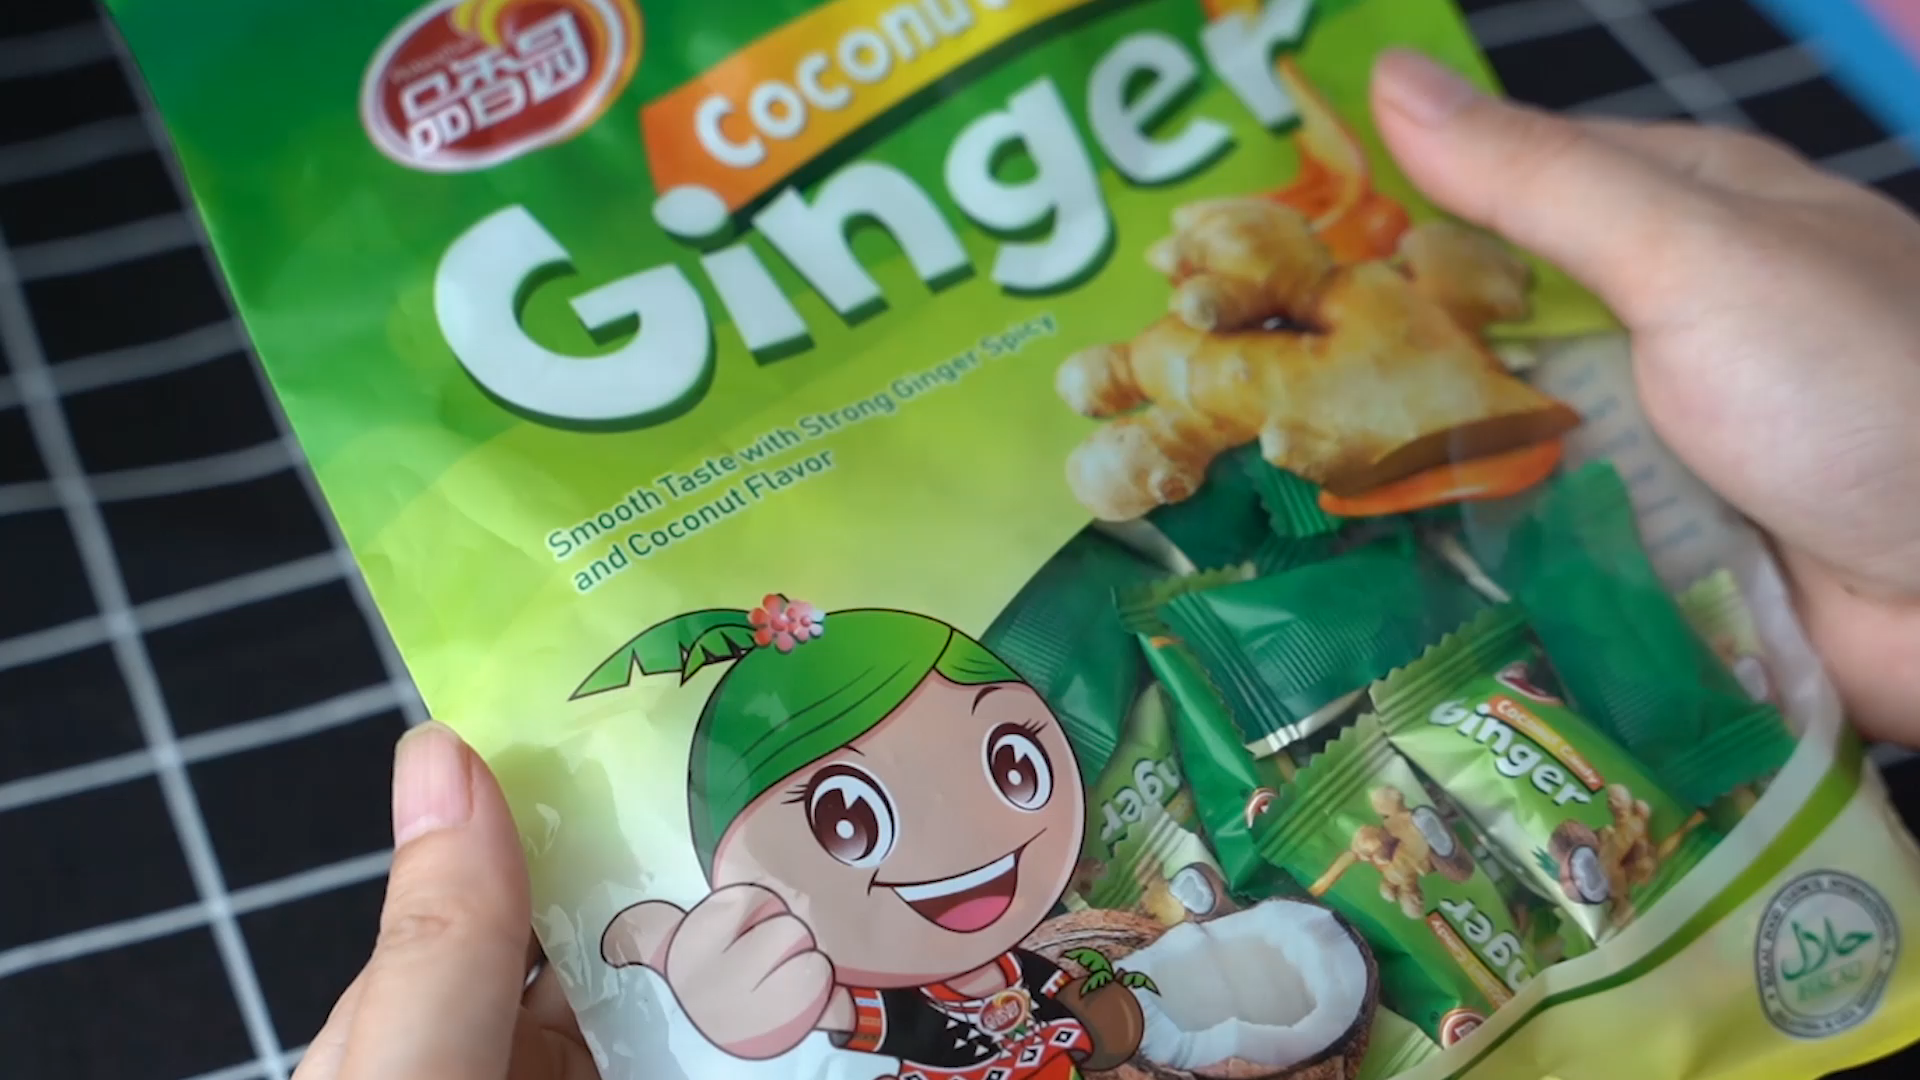 Pin xiang yuan tatlı aromalı sert ZENCEFIL HINDISTAN CEVIZI ŞEKER